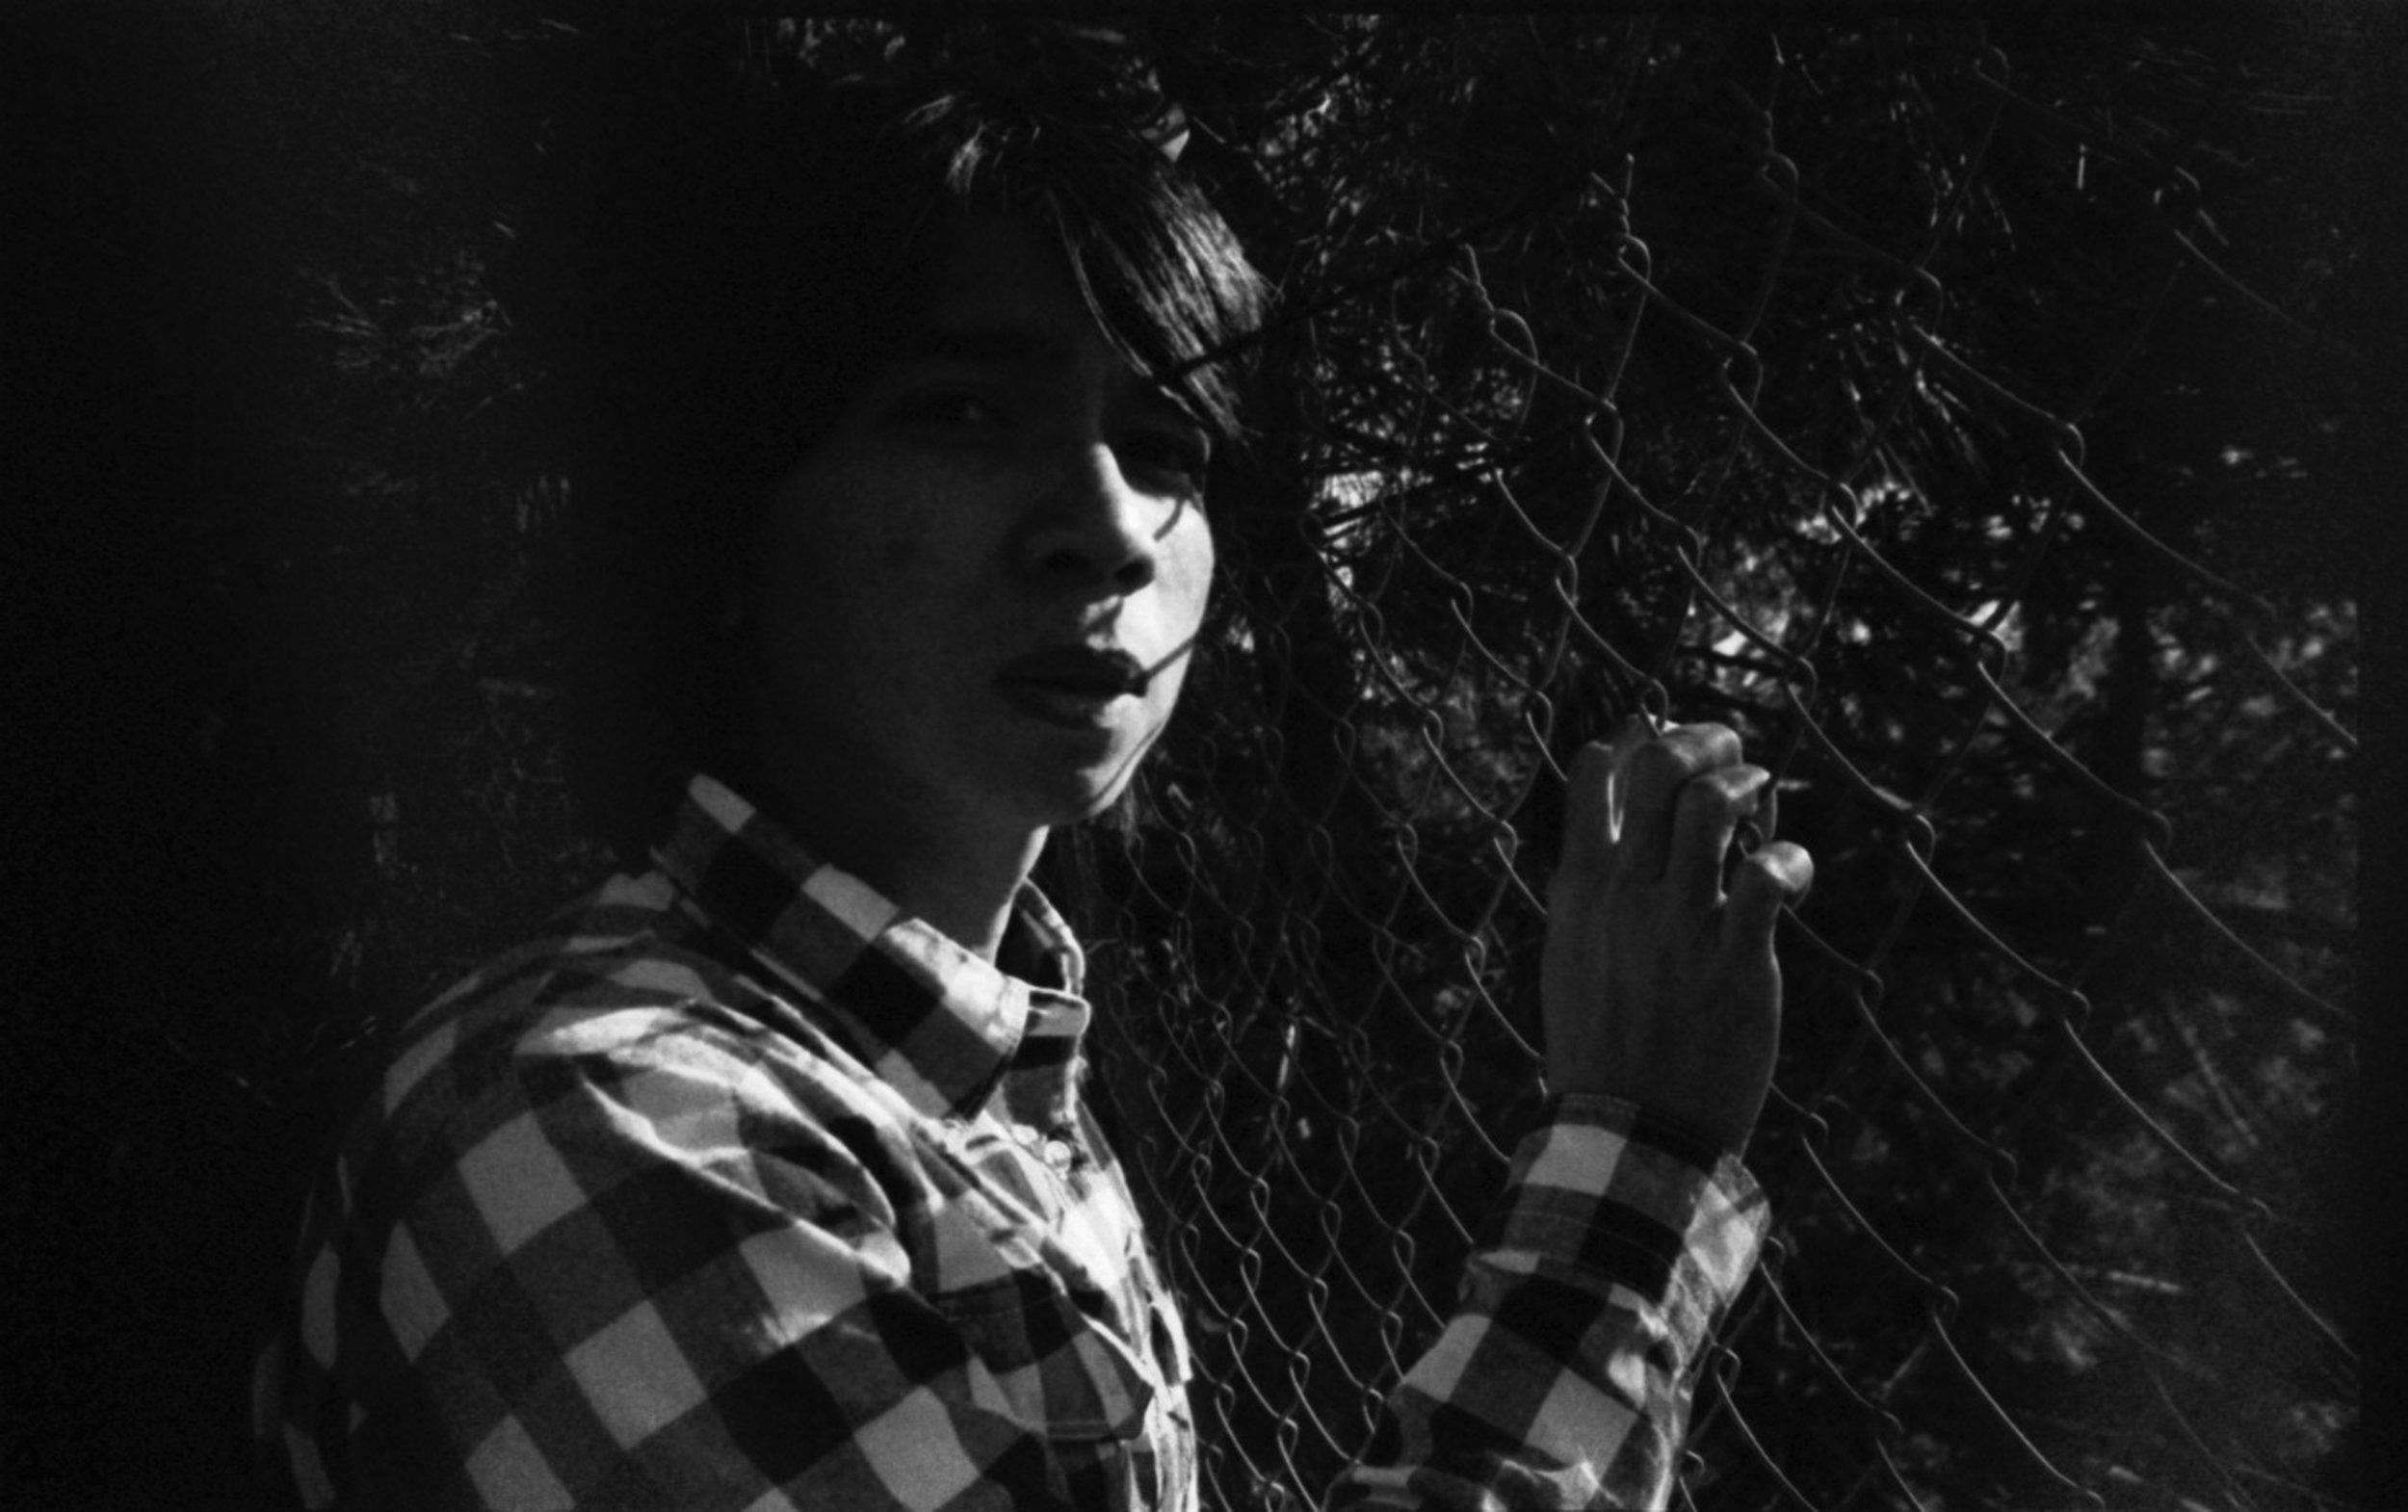 John Torres photographed by Shireen Seno